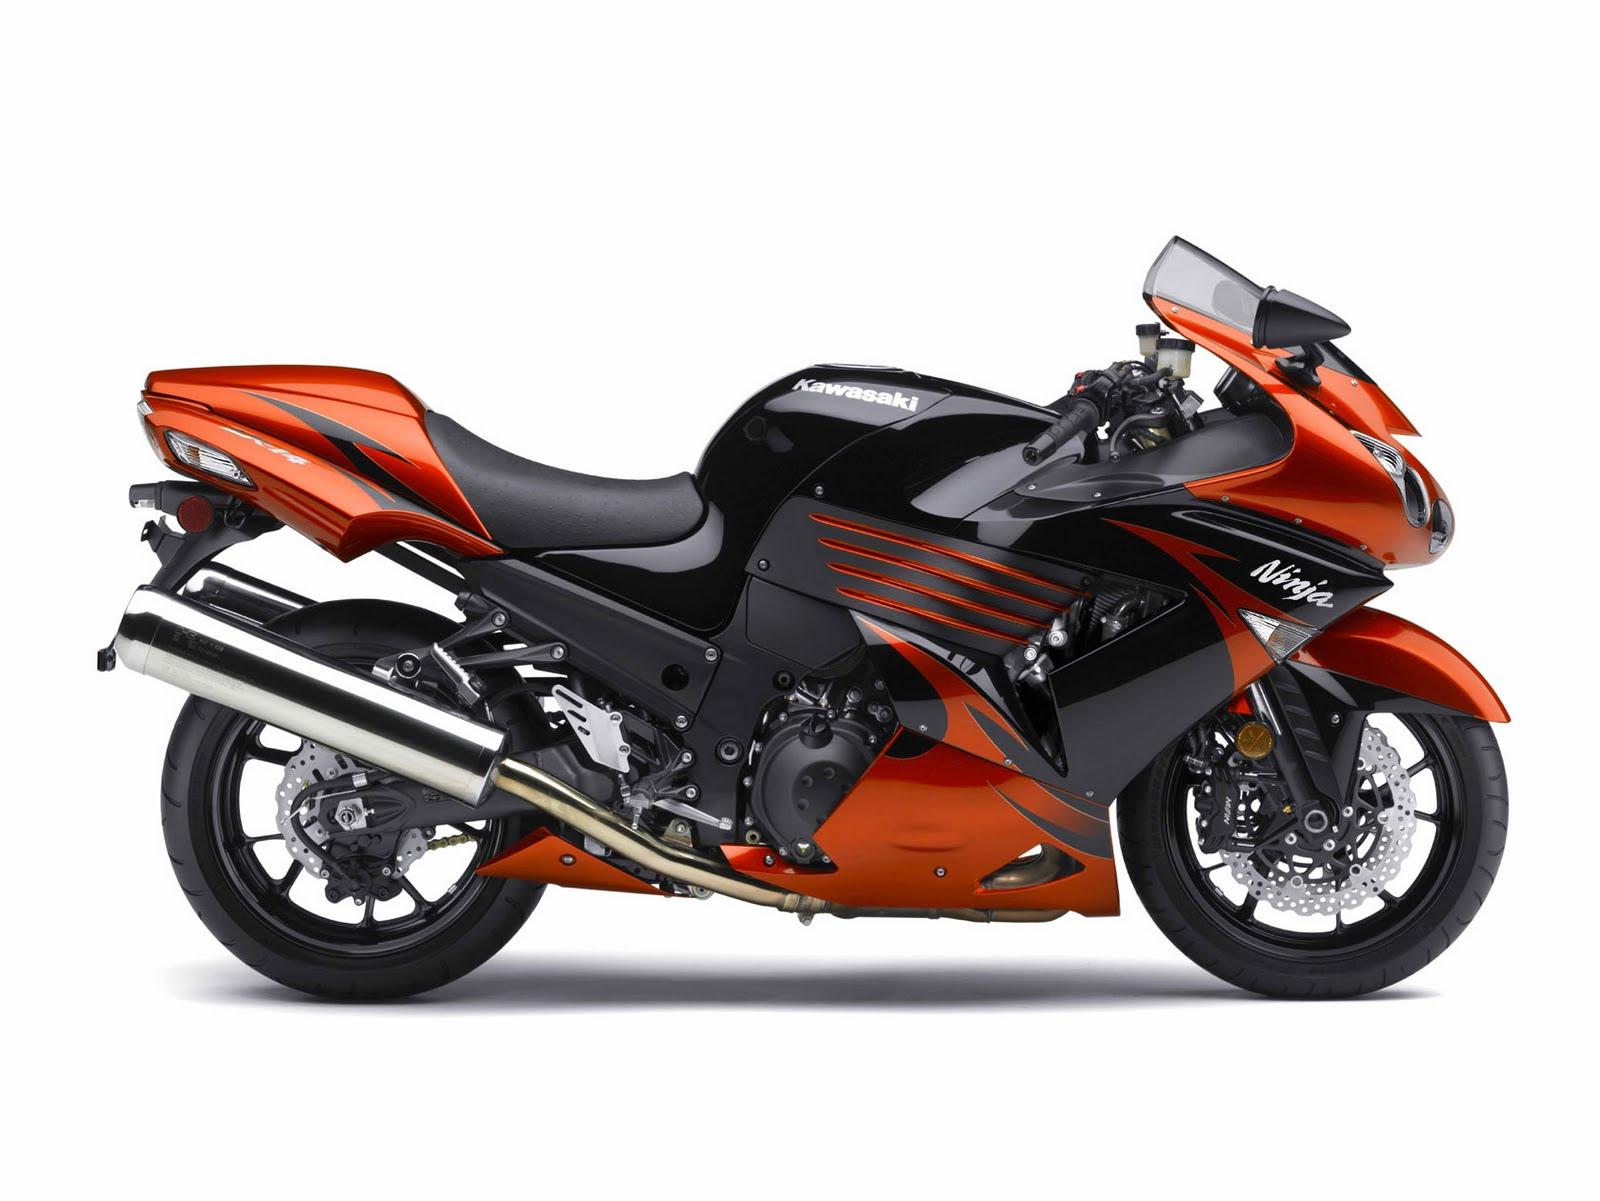 The Best Of Motorcycle: 2009 Kawasaki Ninja ZX-14